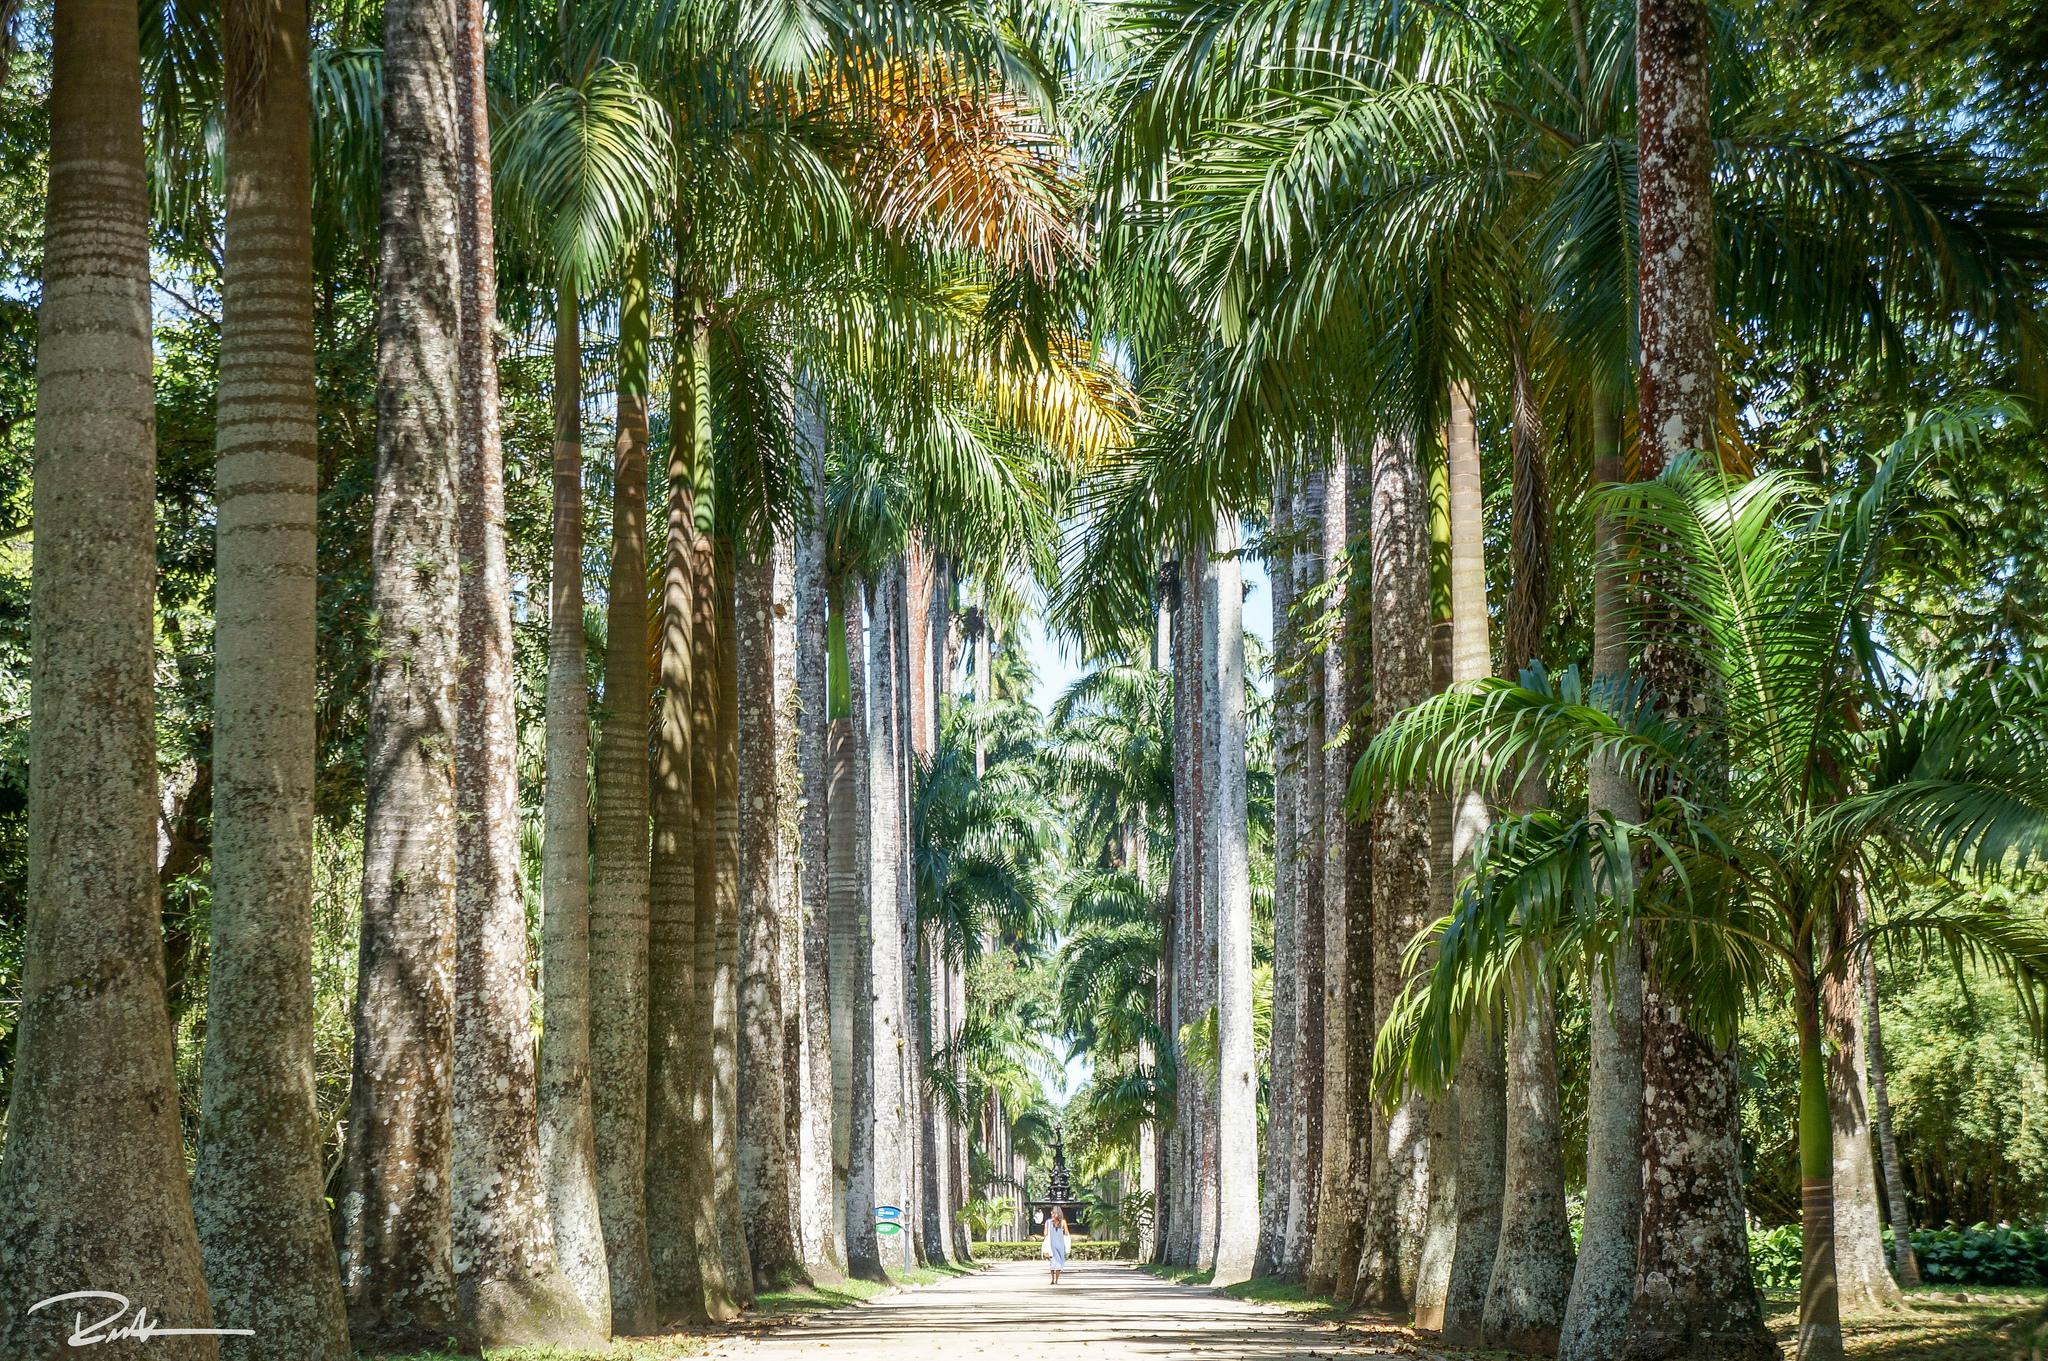 Jardim Botanico's main walkway